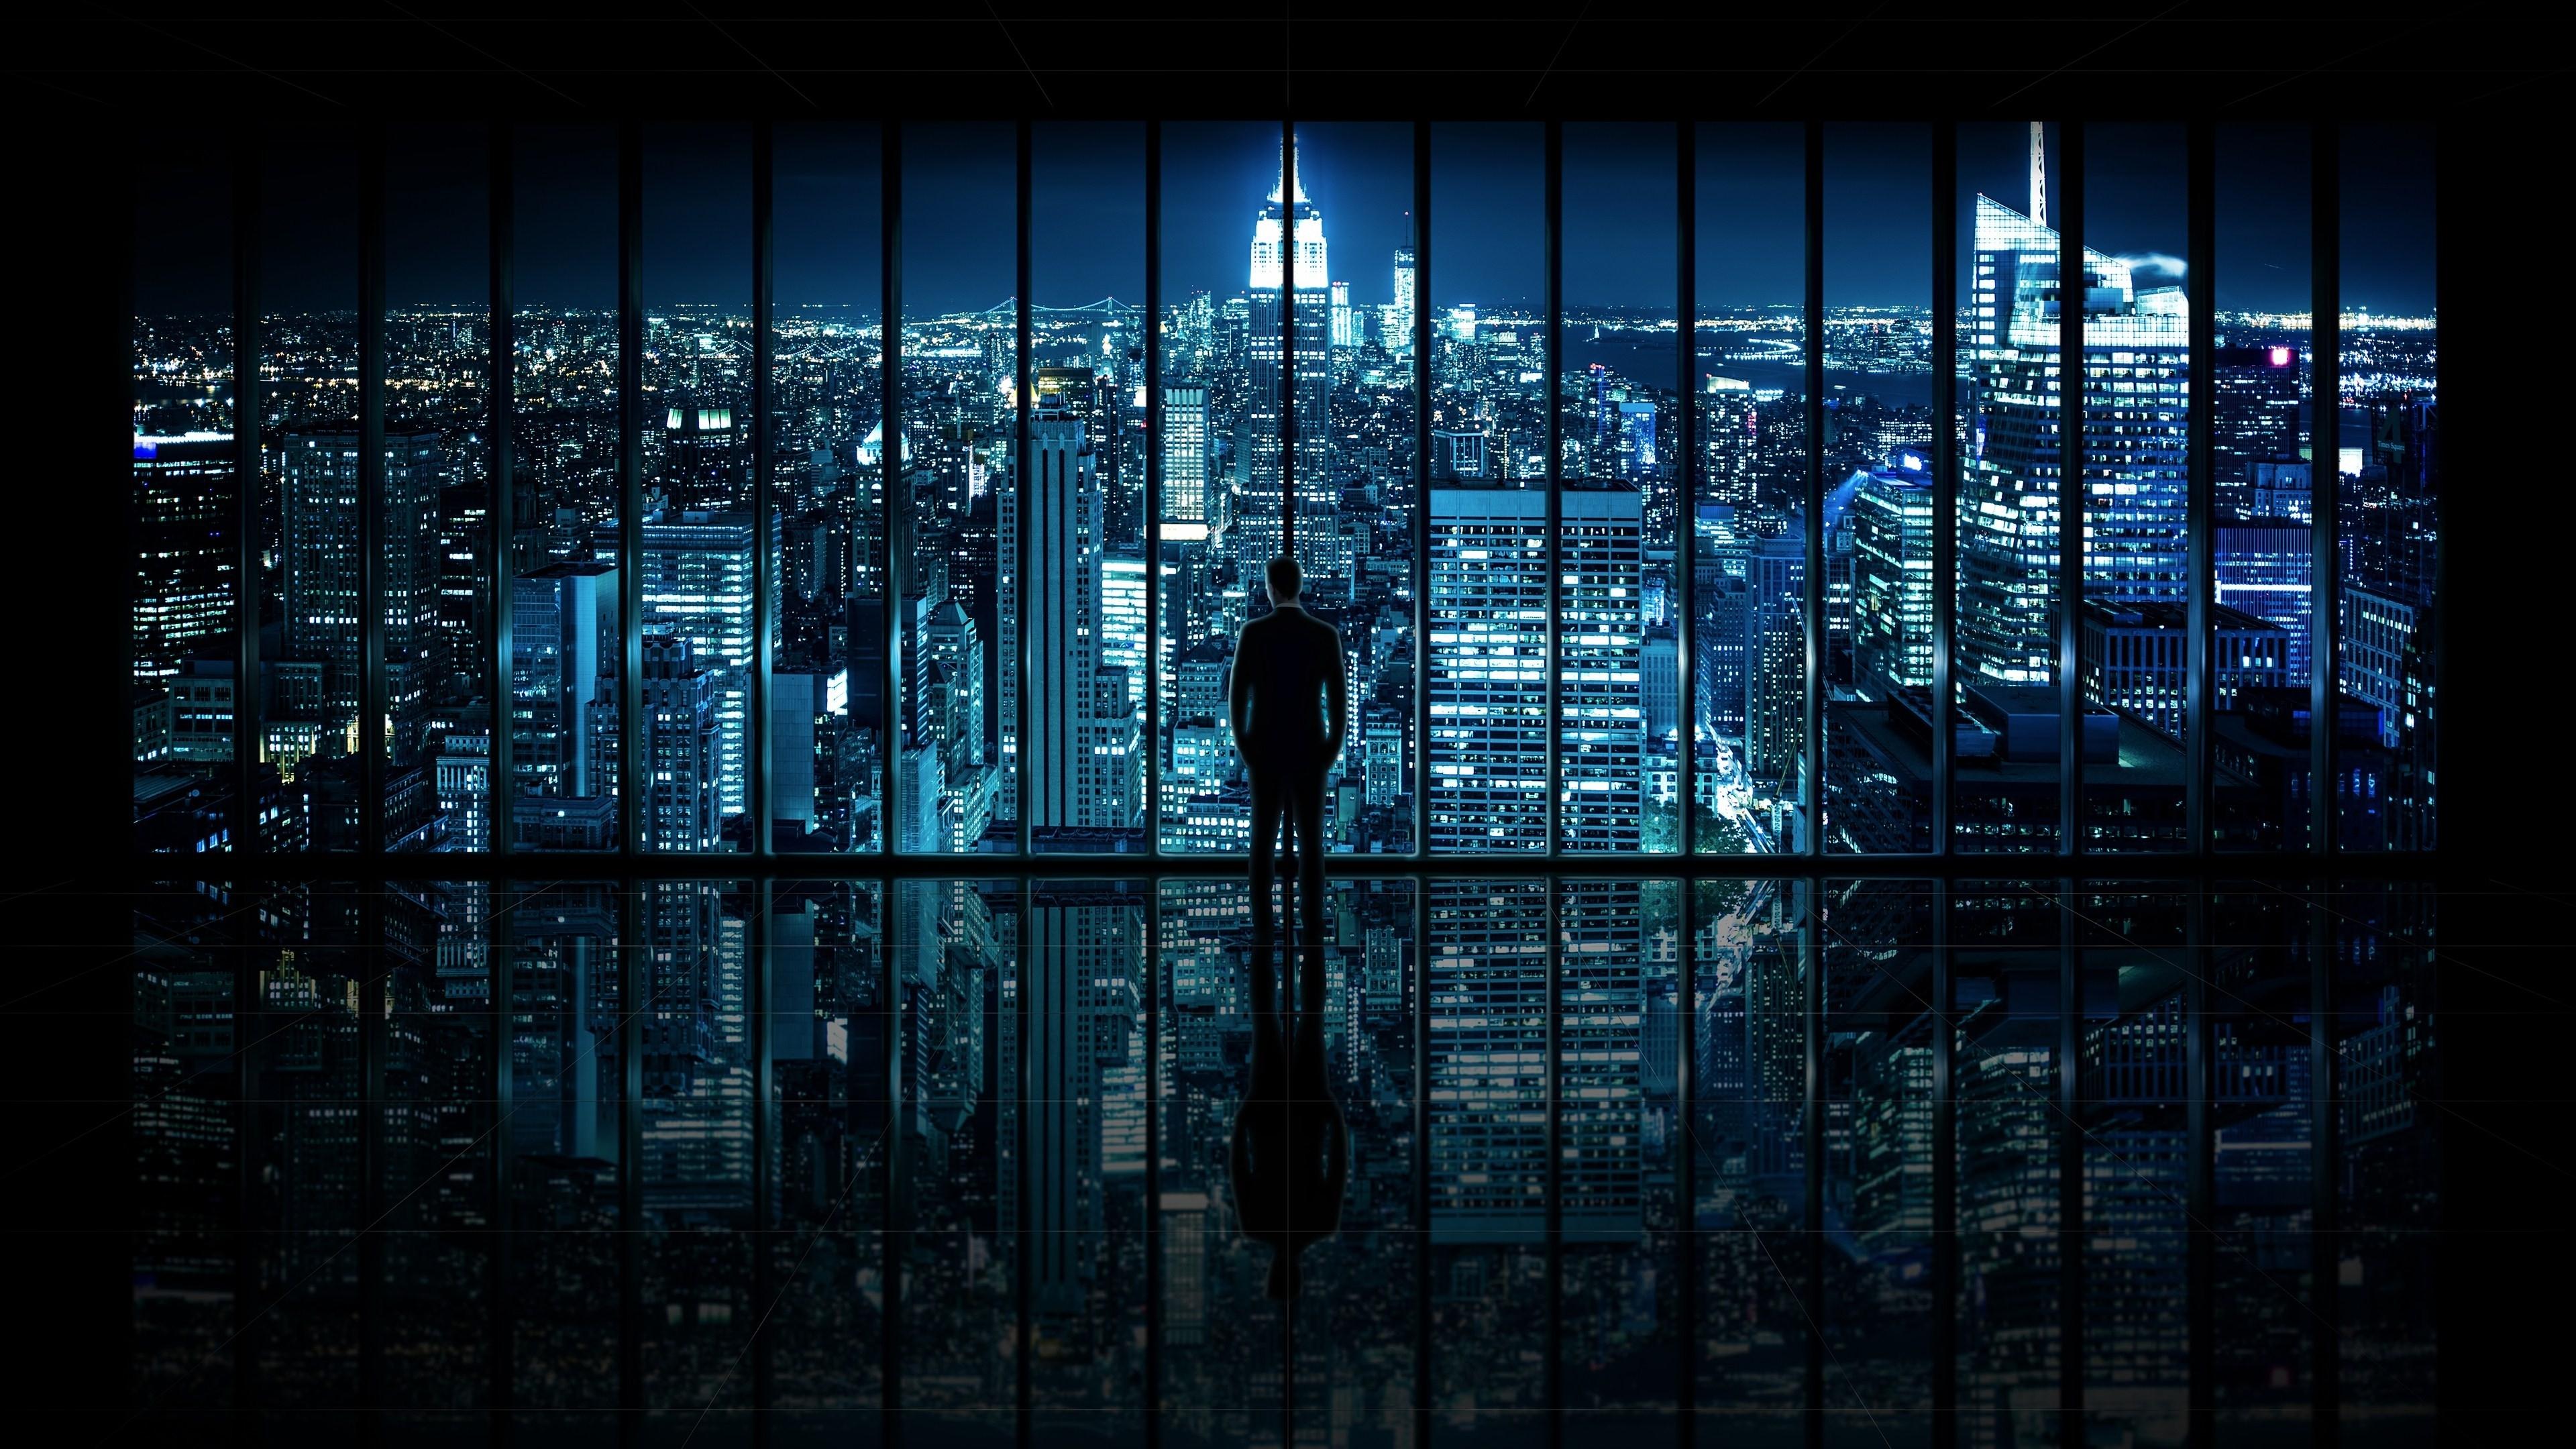 wallpaper : window, cityscape, night, reflection, silhouette